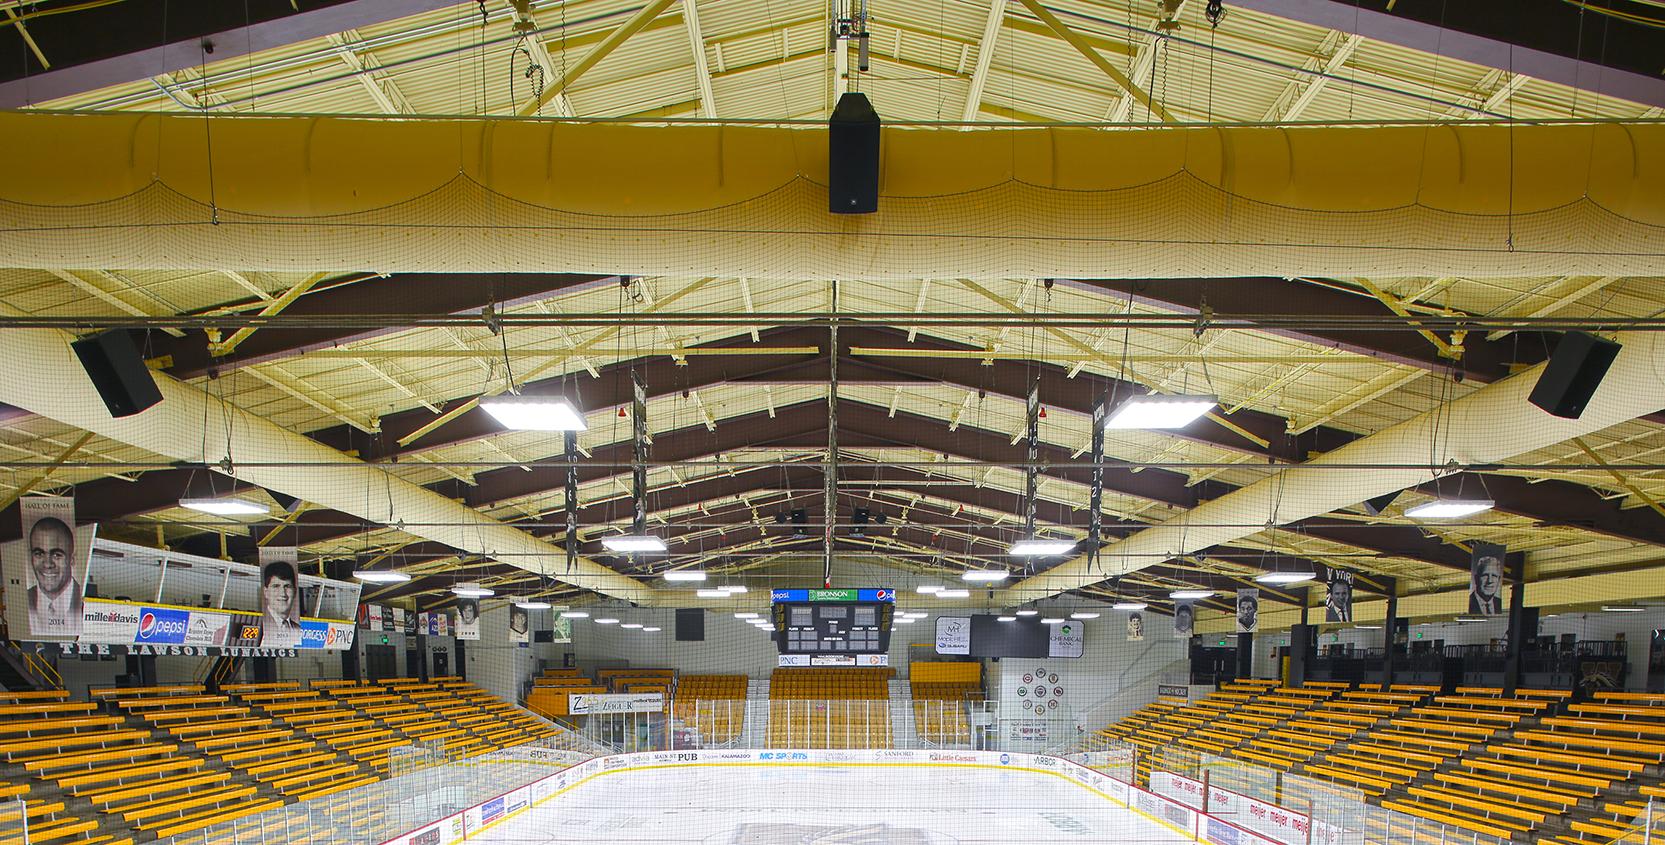 Lawson_Ice_Arena-2-1665x845